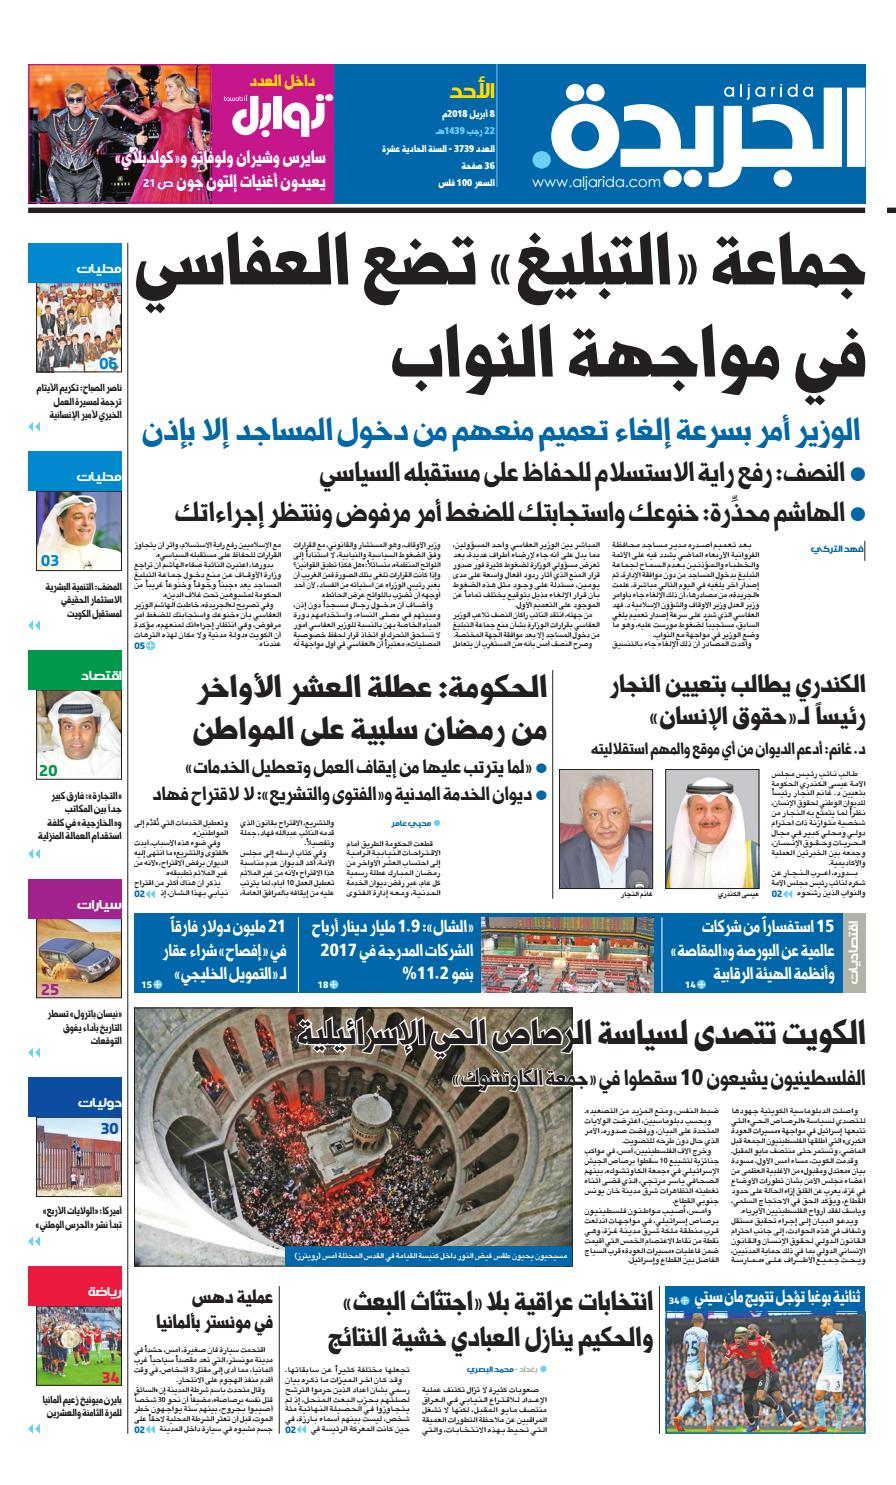 eb1b2beb1 عدد الجريدة الأحد 08 أبريل 2018 by Aljarida Newspaper - issuu